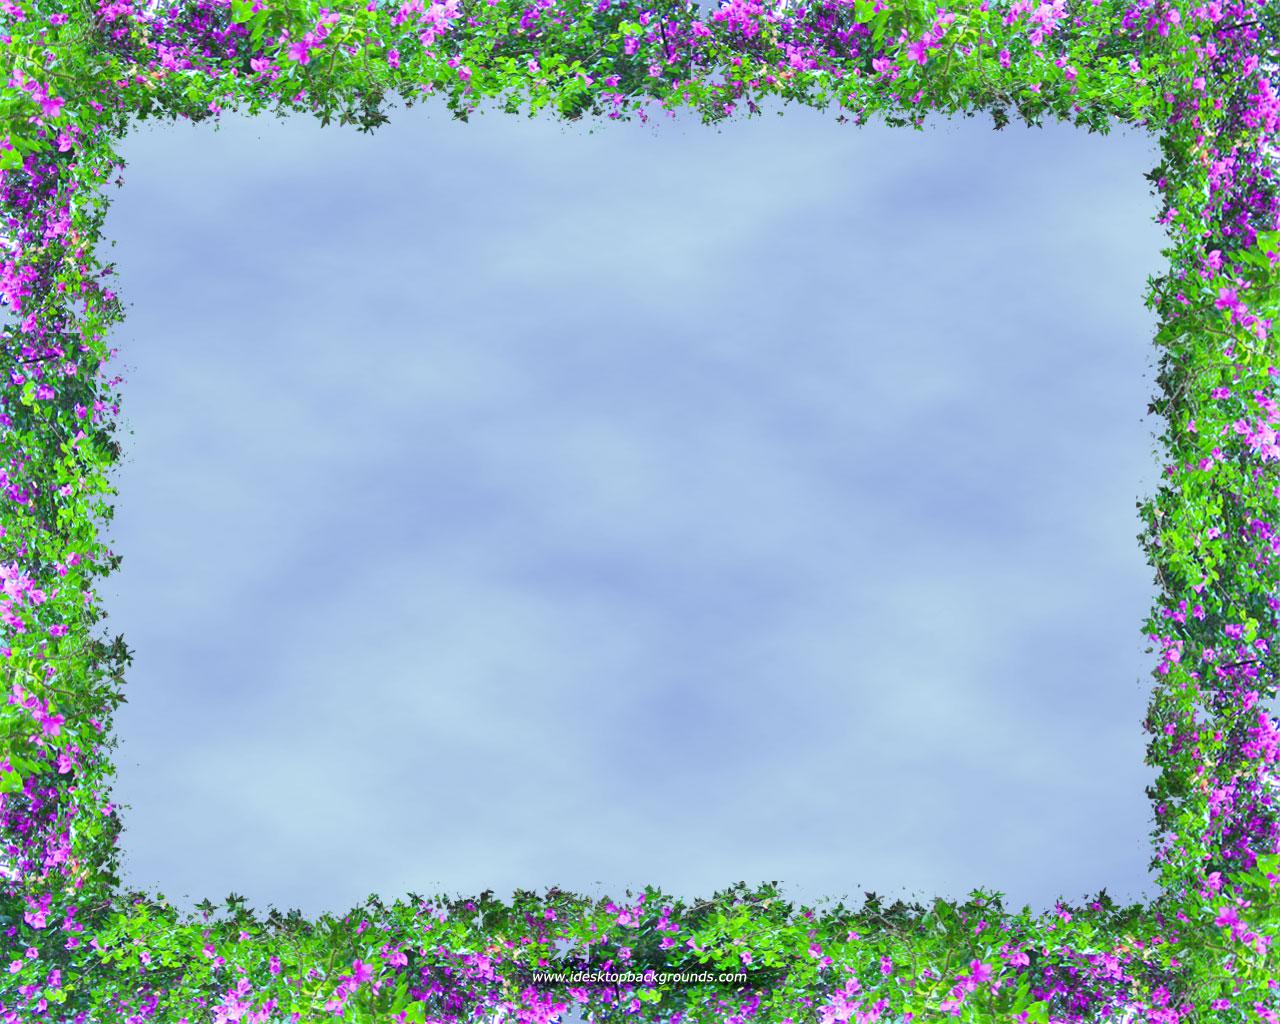 Clip Art Wallpaper Backgrounds - WallpaperSafari